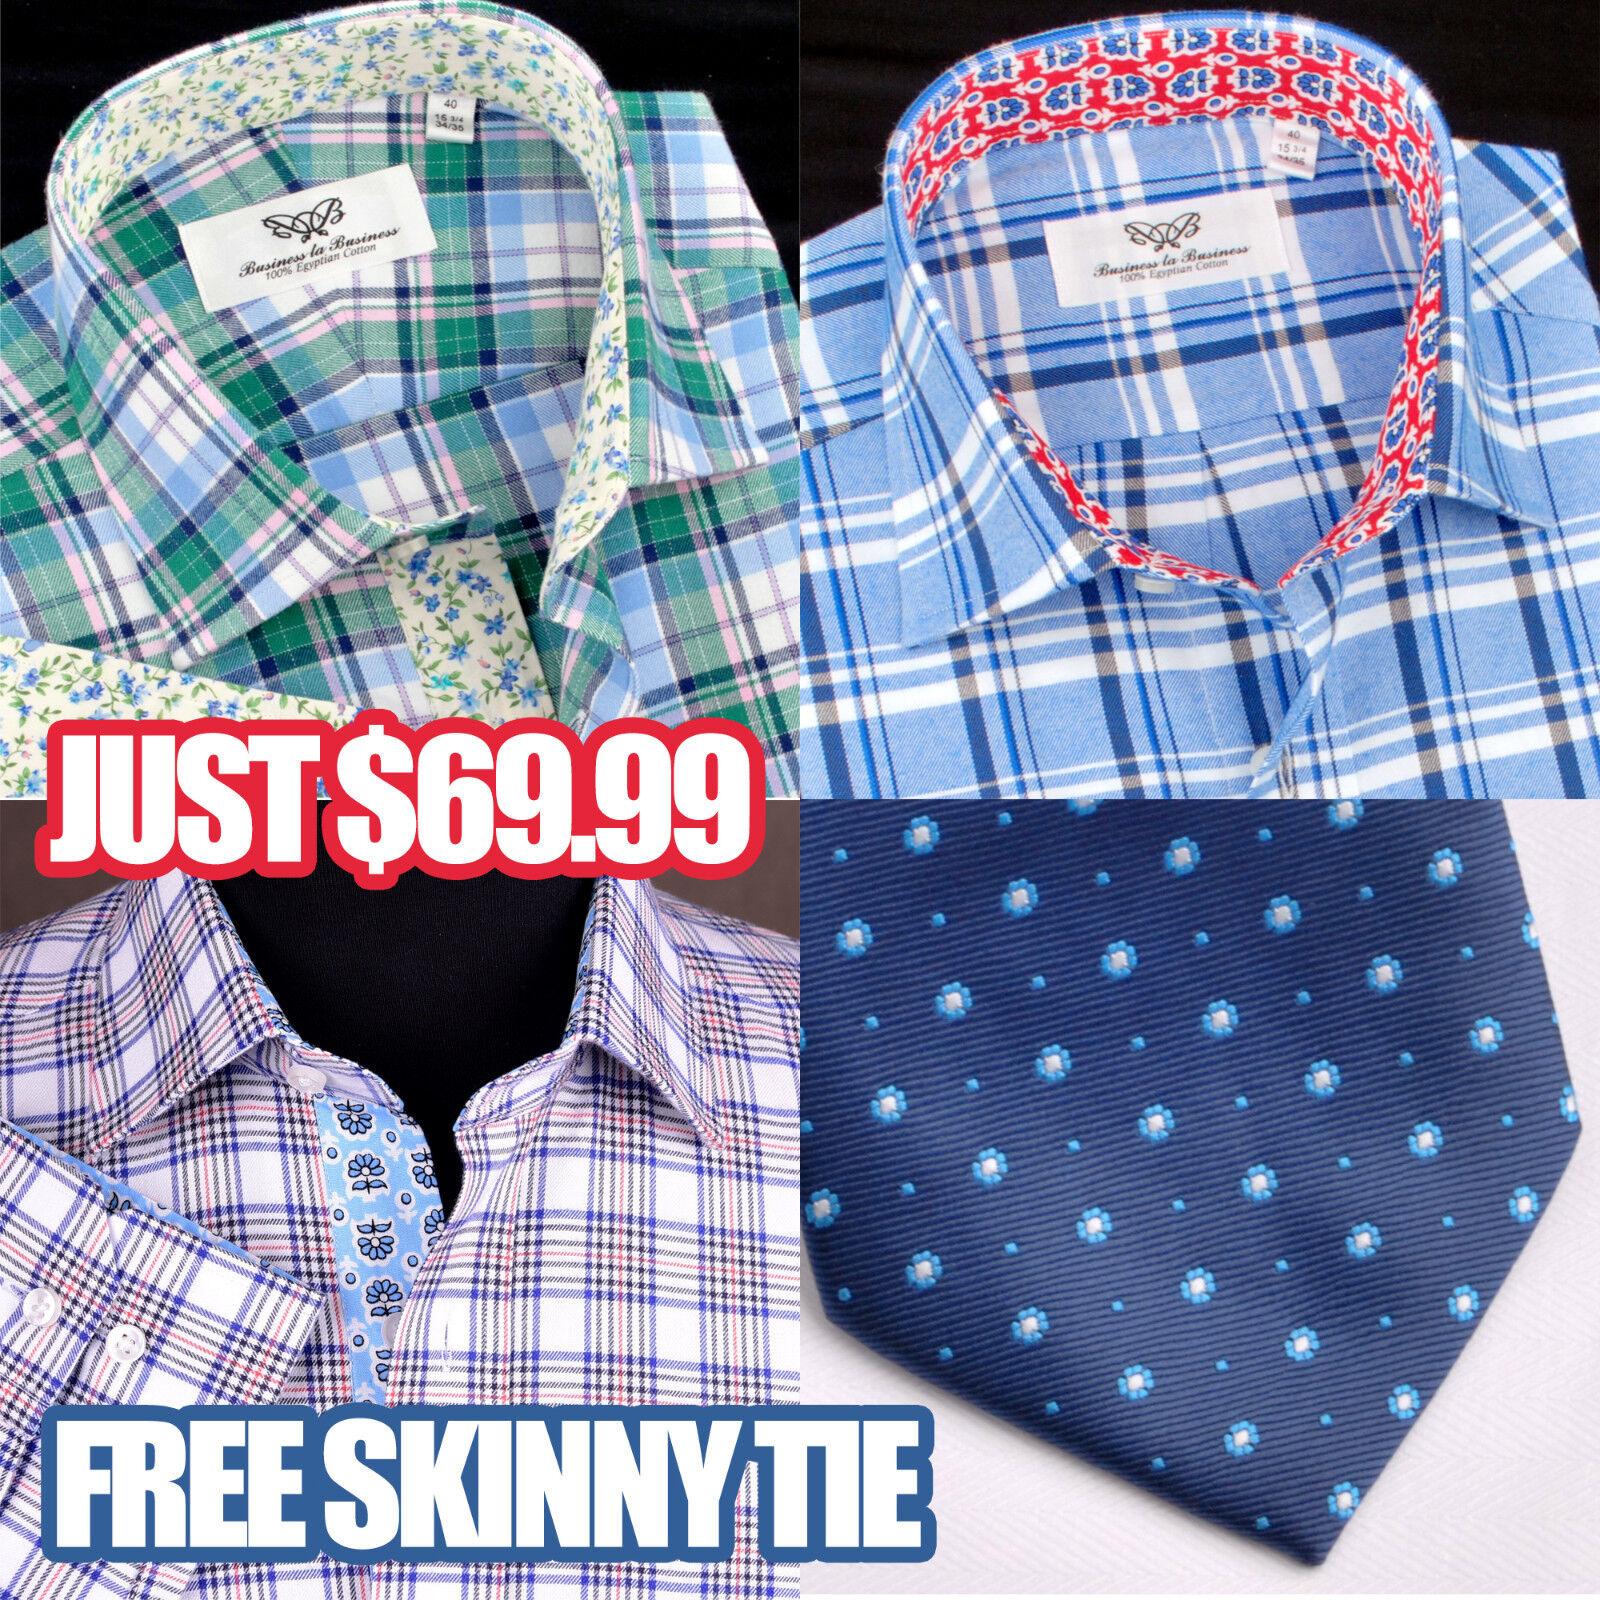 3x Luxury Casual Dress Shirts Luxury Stylish Flannel Hot Design Free Skinny Tie